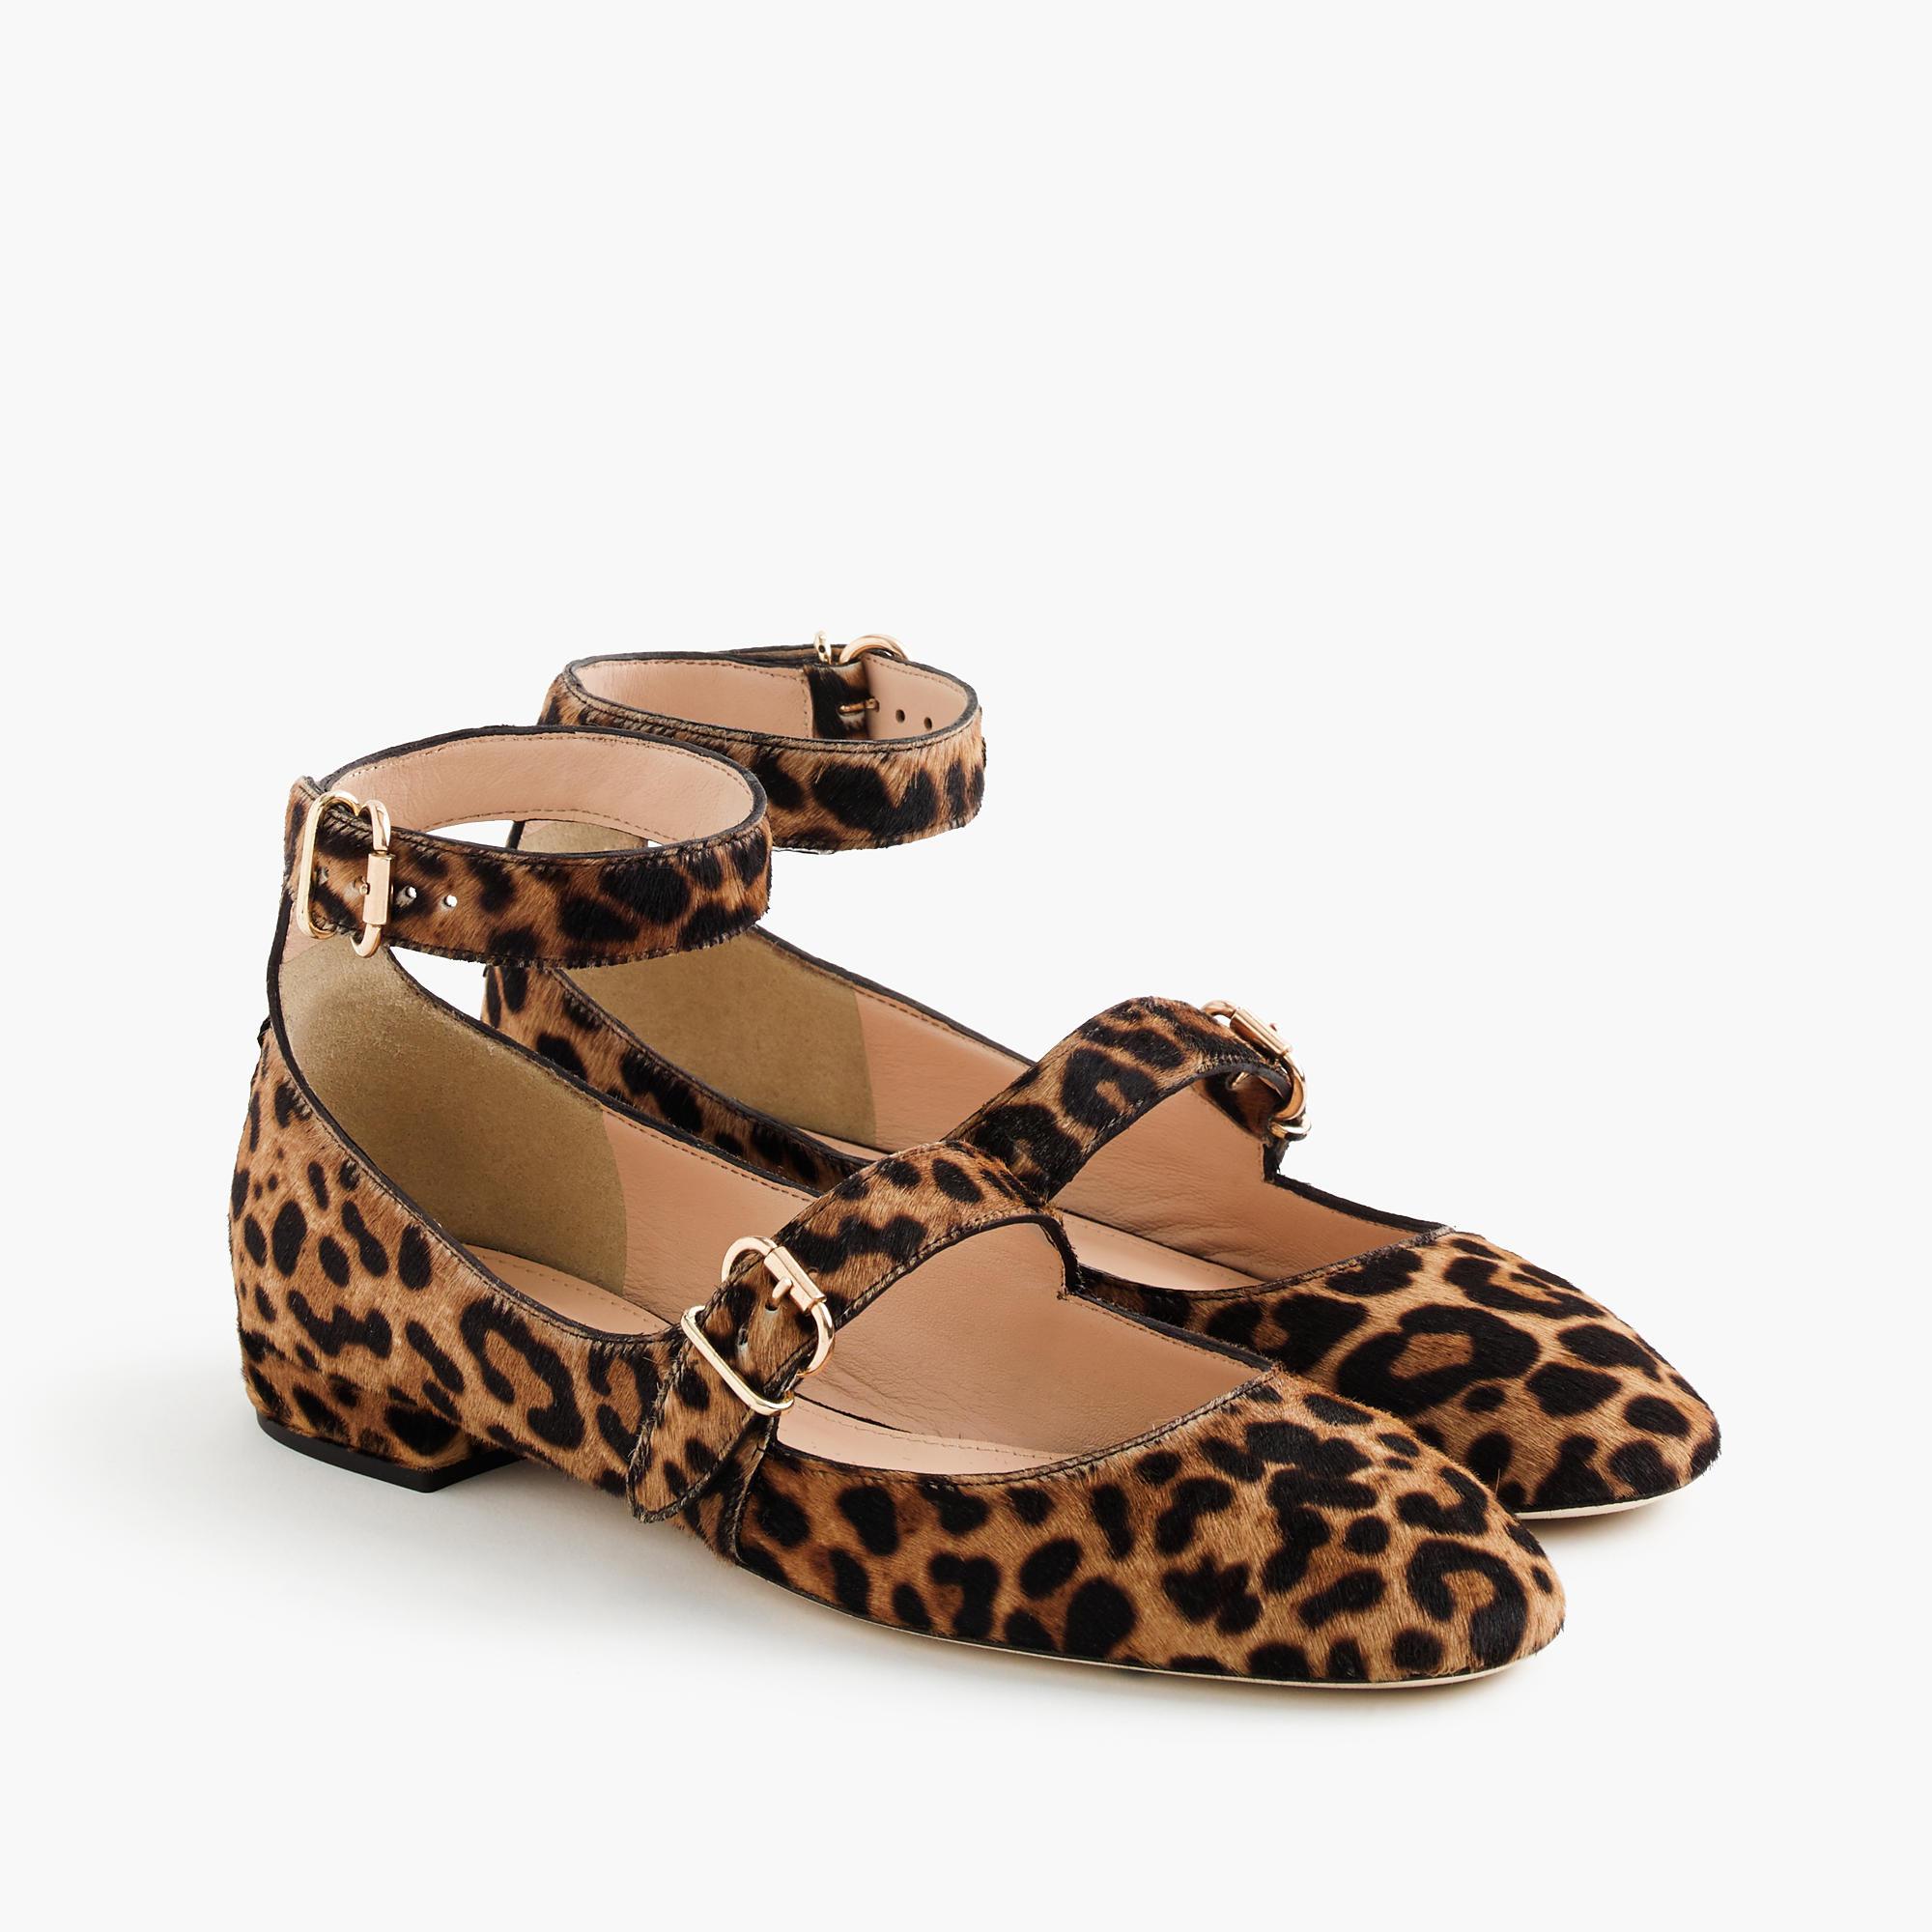 The season of stylish flats is here! Fall shoe love: J.Crew Double-strap Flats in Leopard Calf Hair | glitterinc.com | @glitterinc